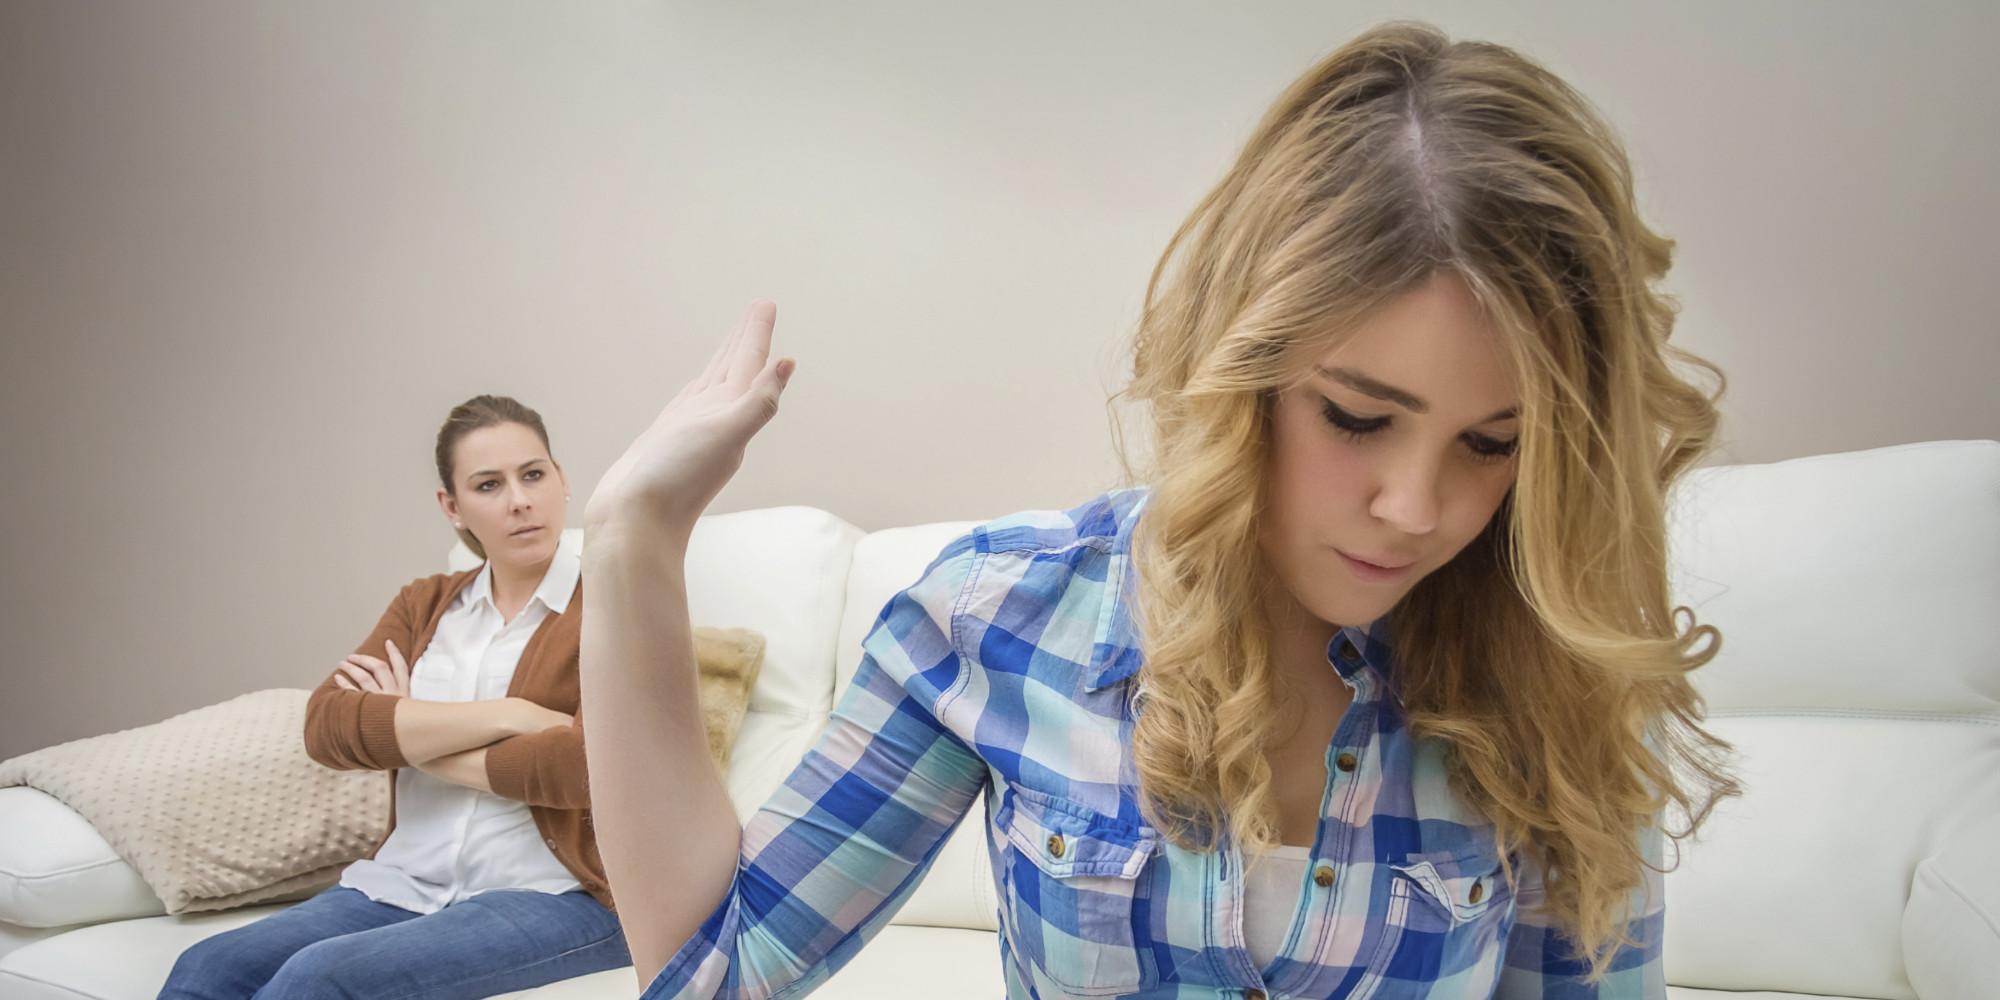 Resent Parent